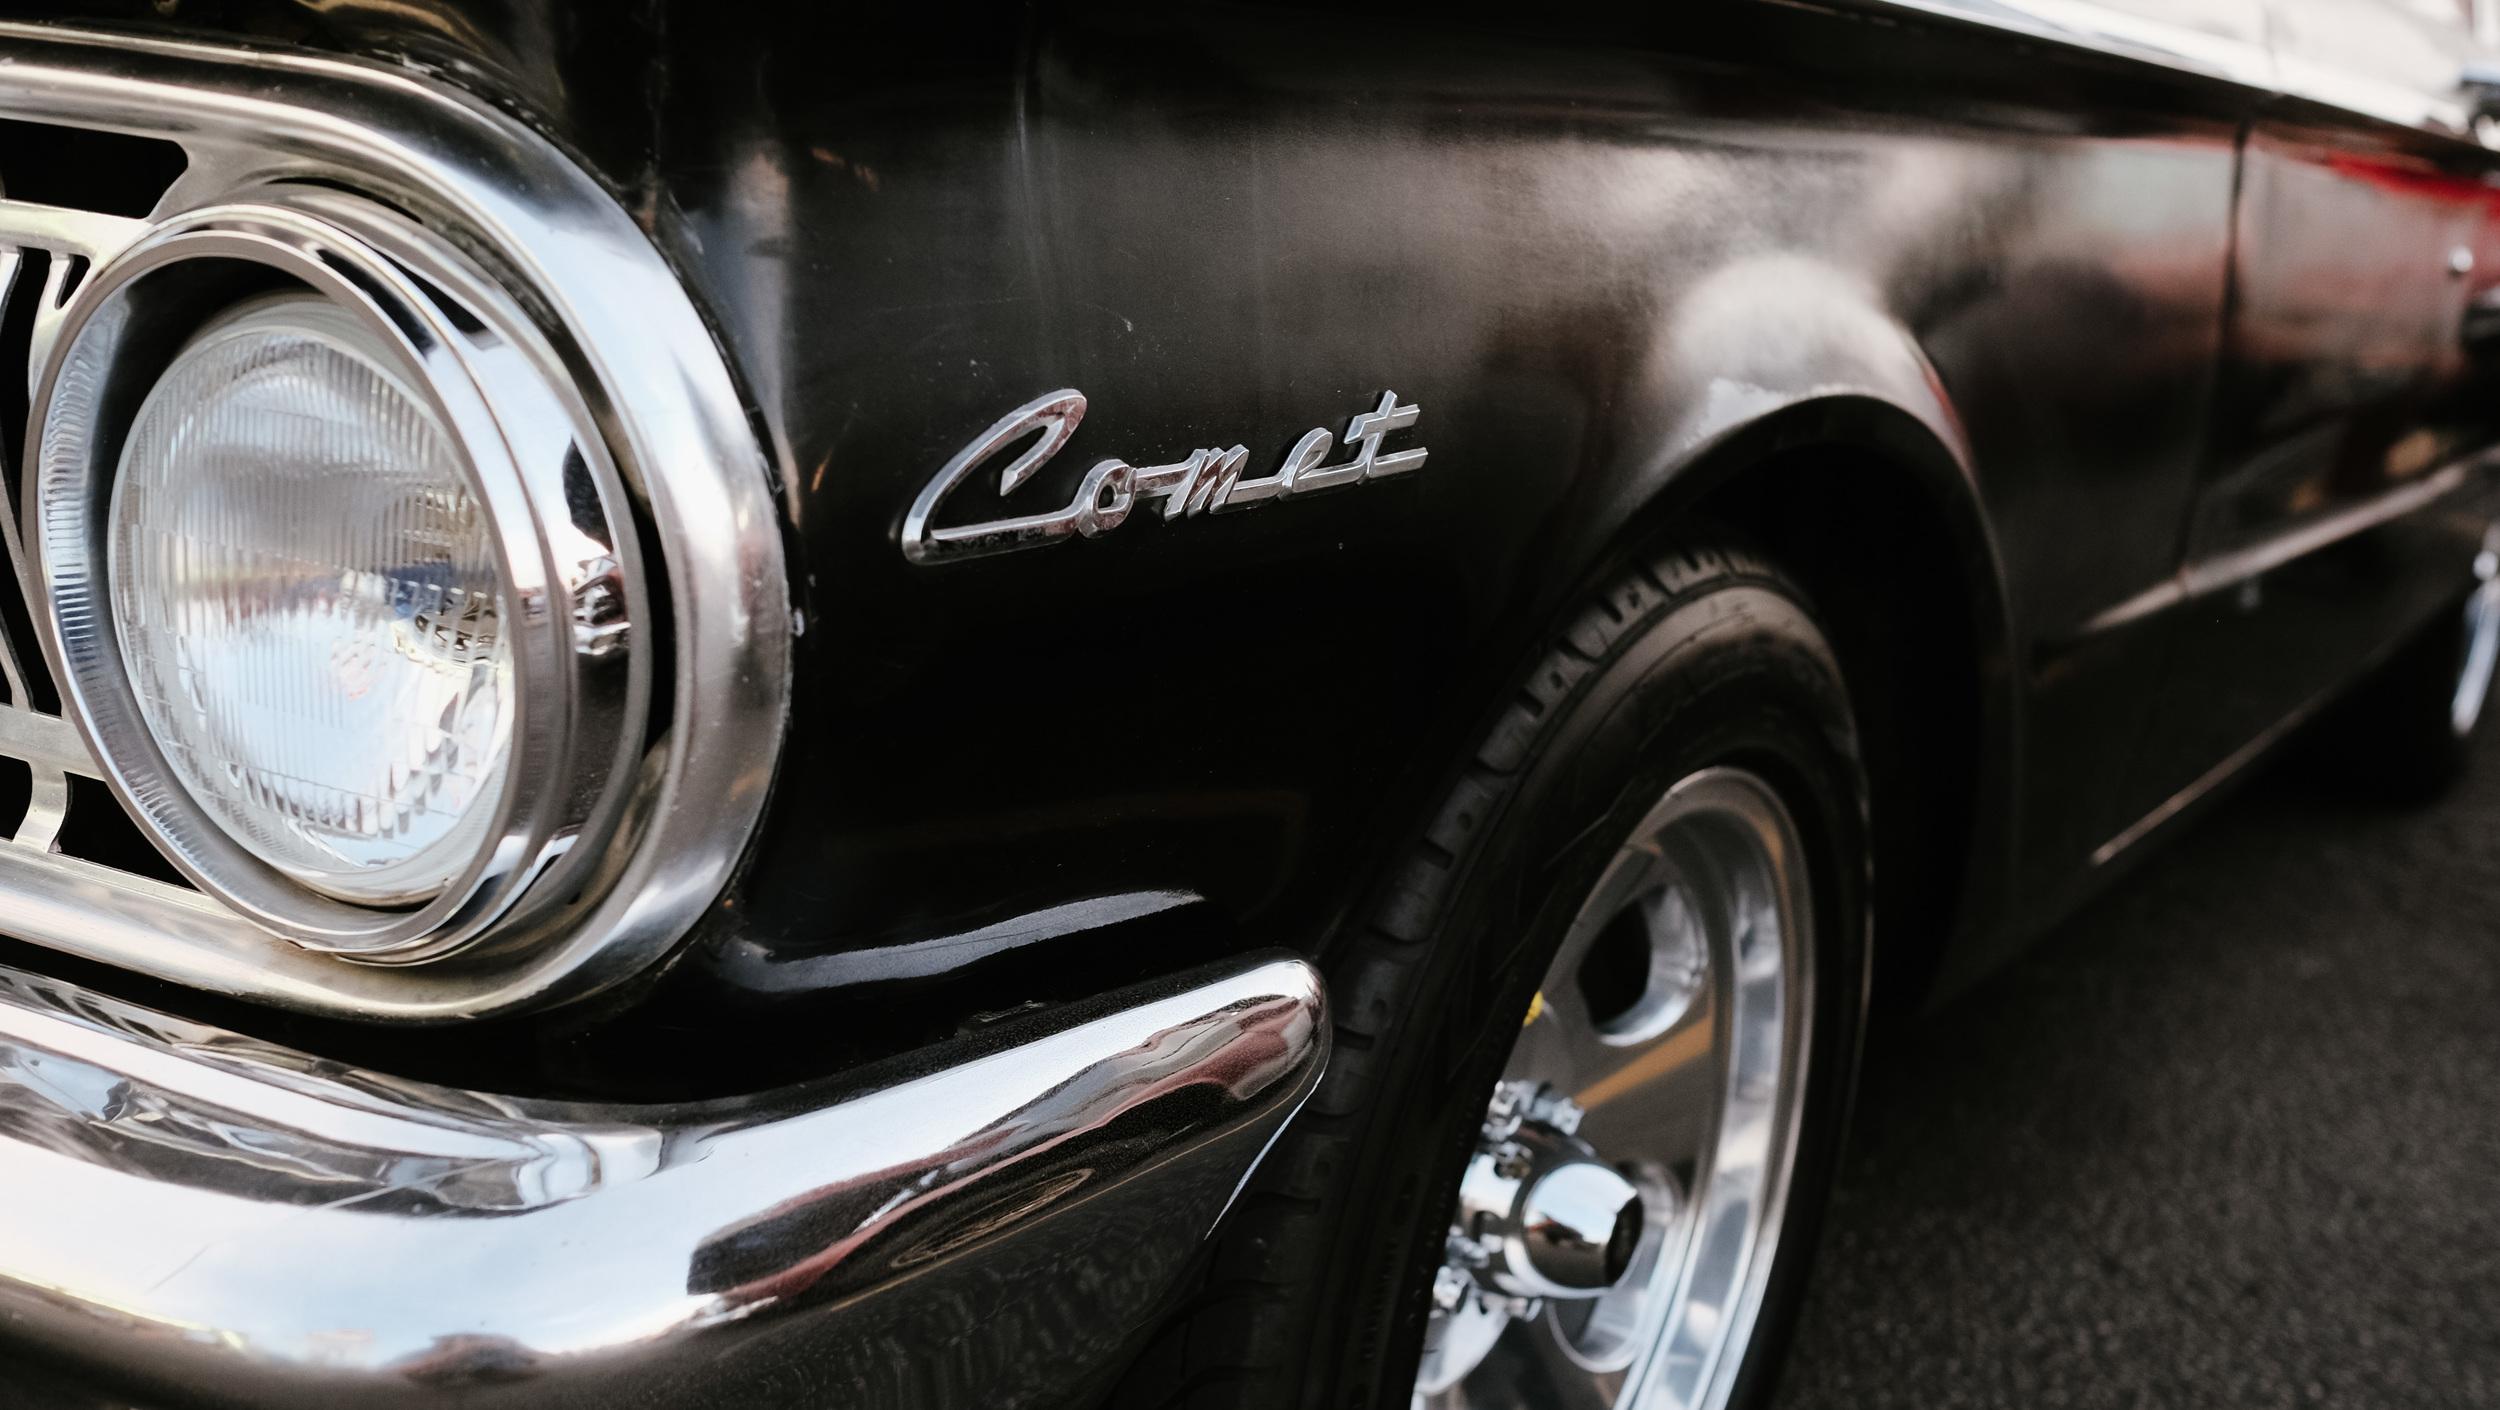 Top-Notch-Car-Show-09052015-2573.jpg